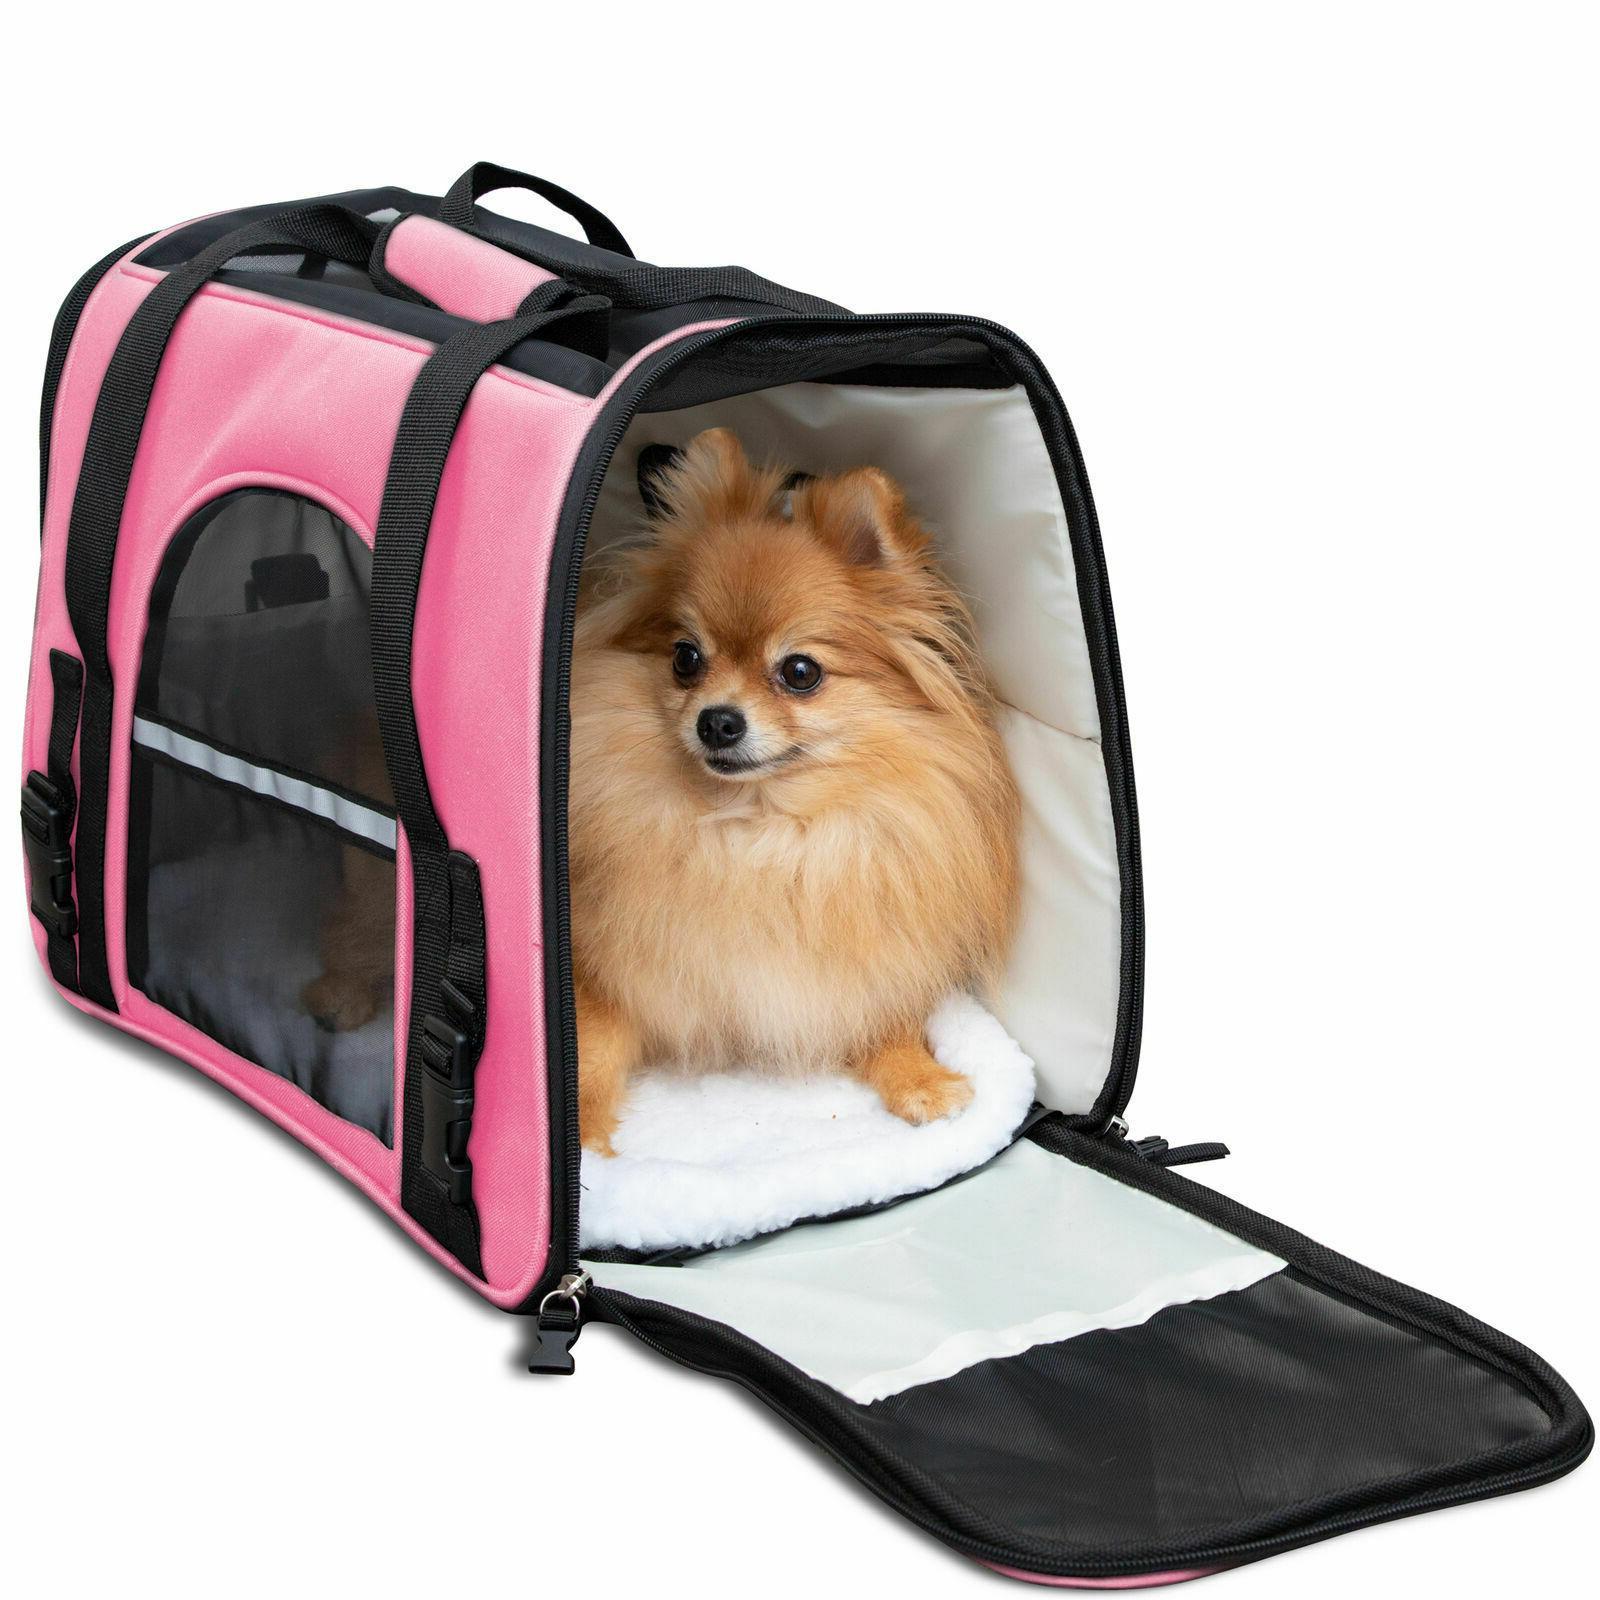 Pet Bag Travel Case Airline Approved Sided Comfort for Cat Dog